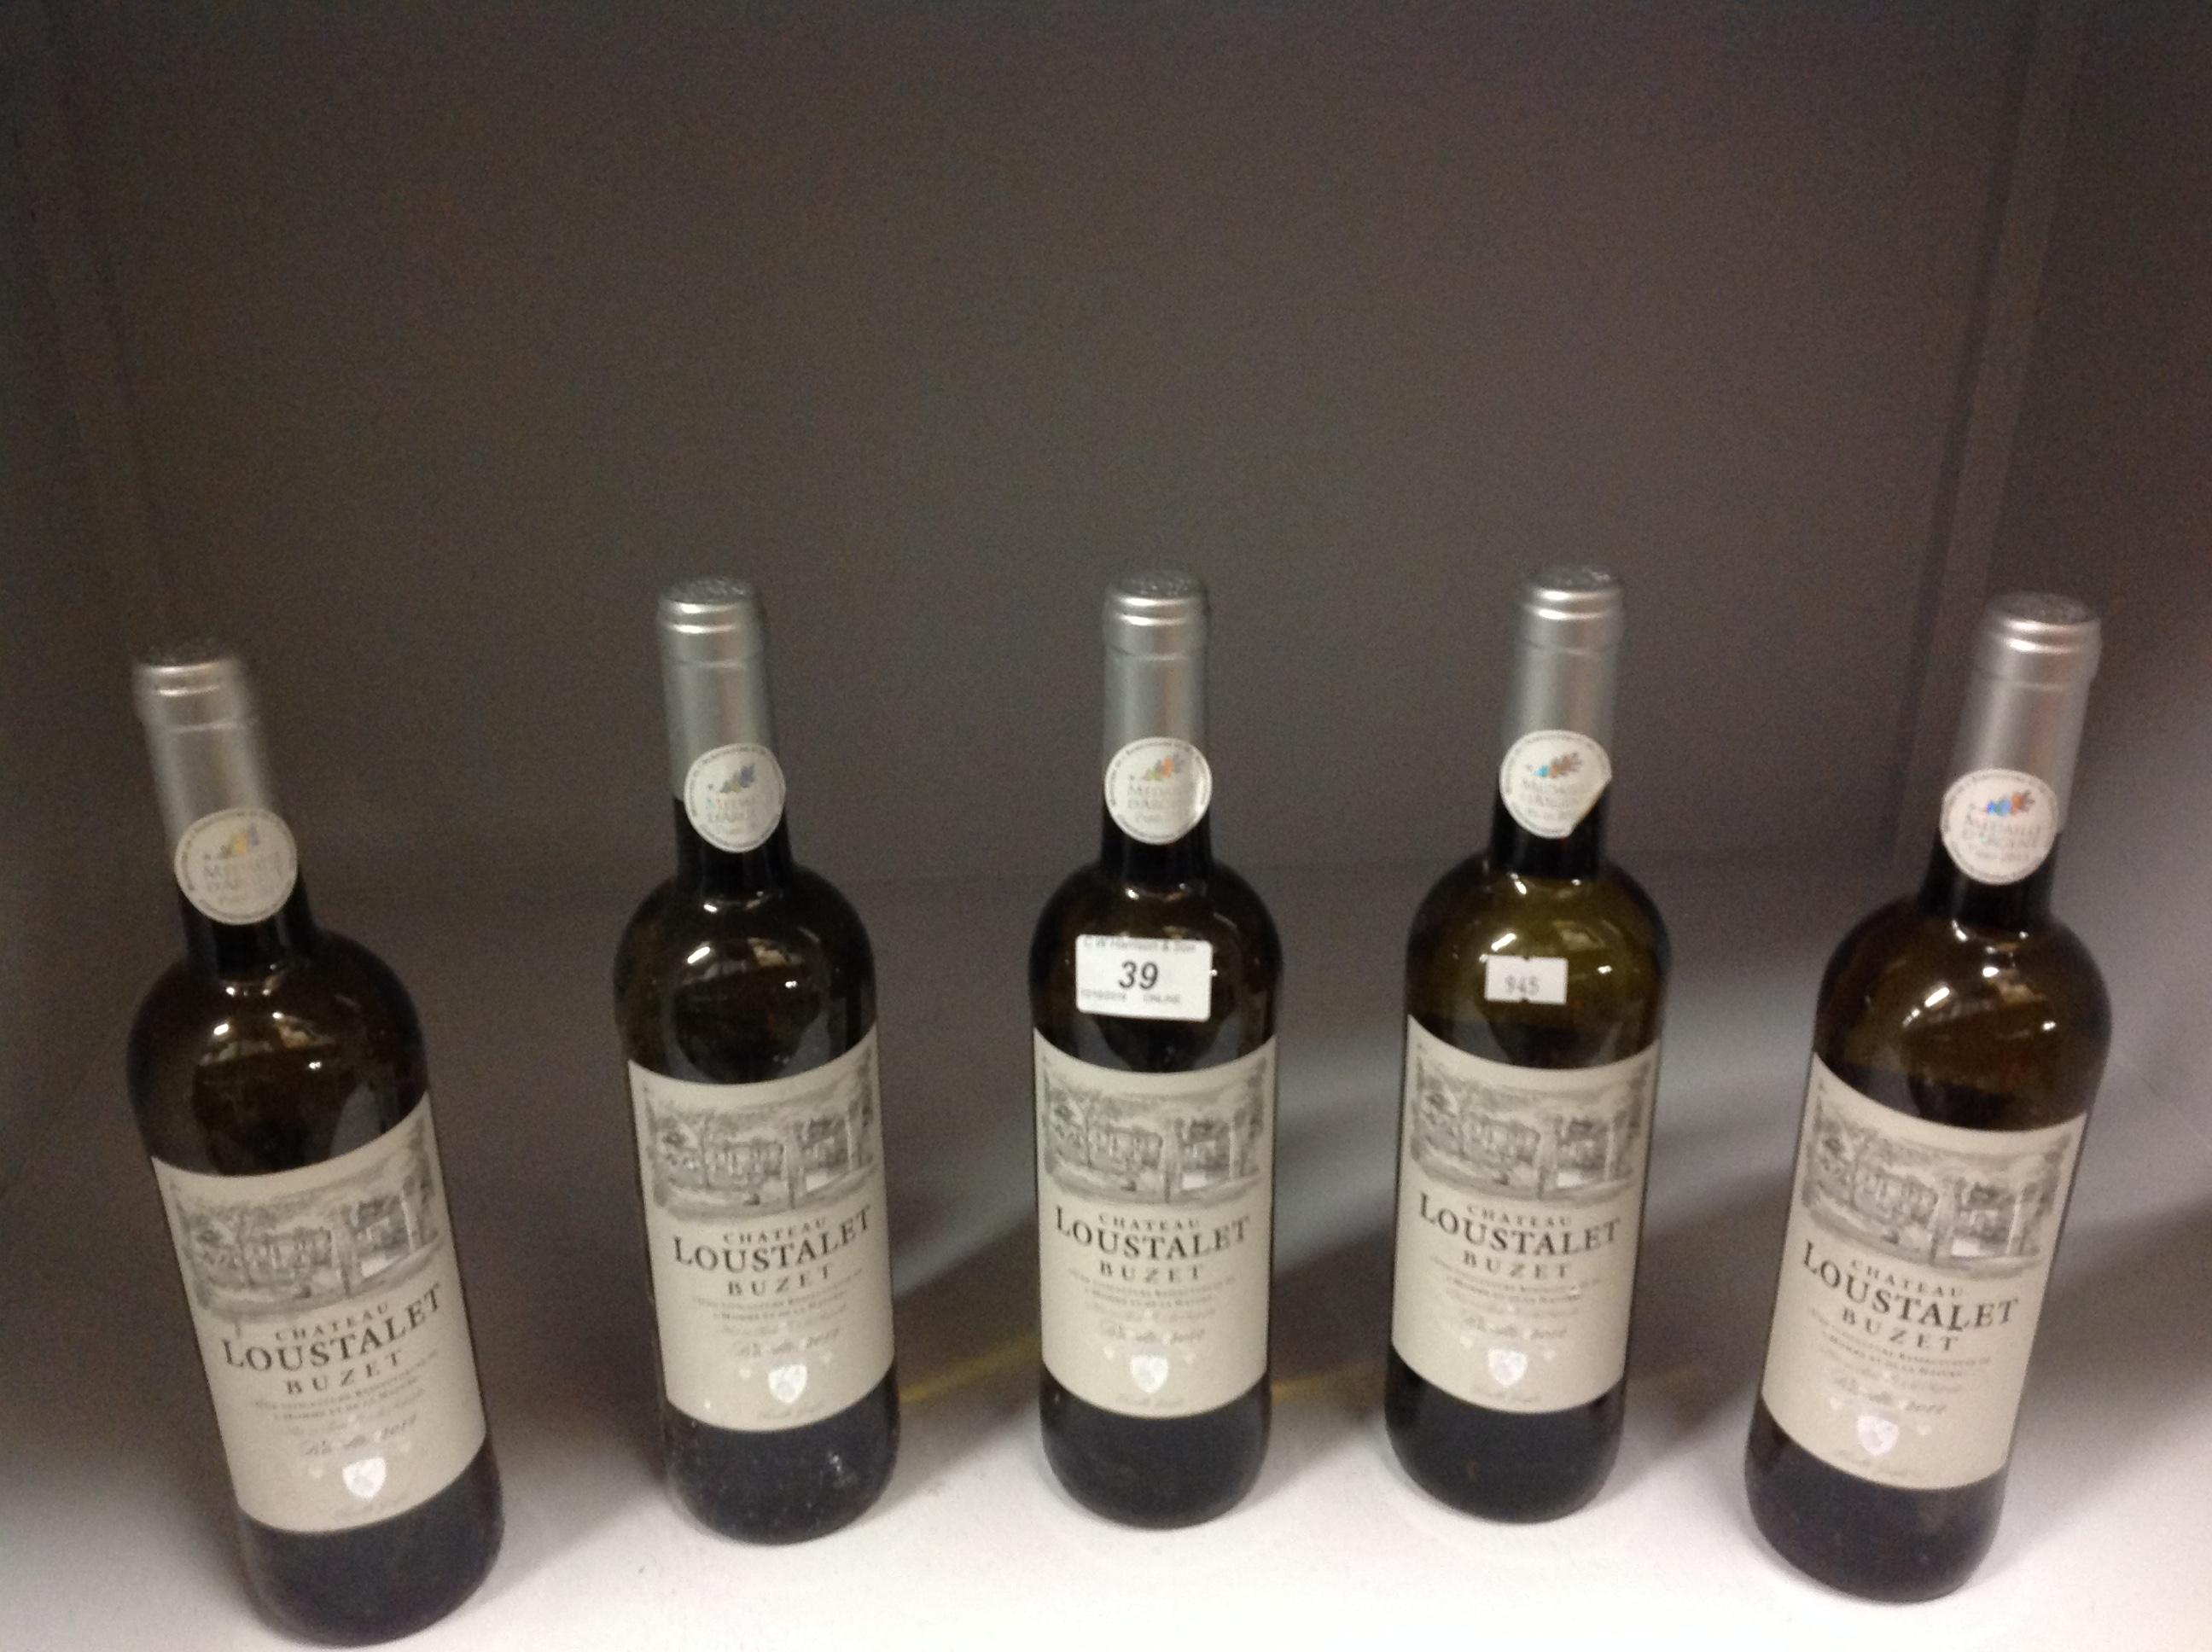 Lot 39 - 5 x 750ml bottles of Chateau Loustalet B